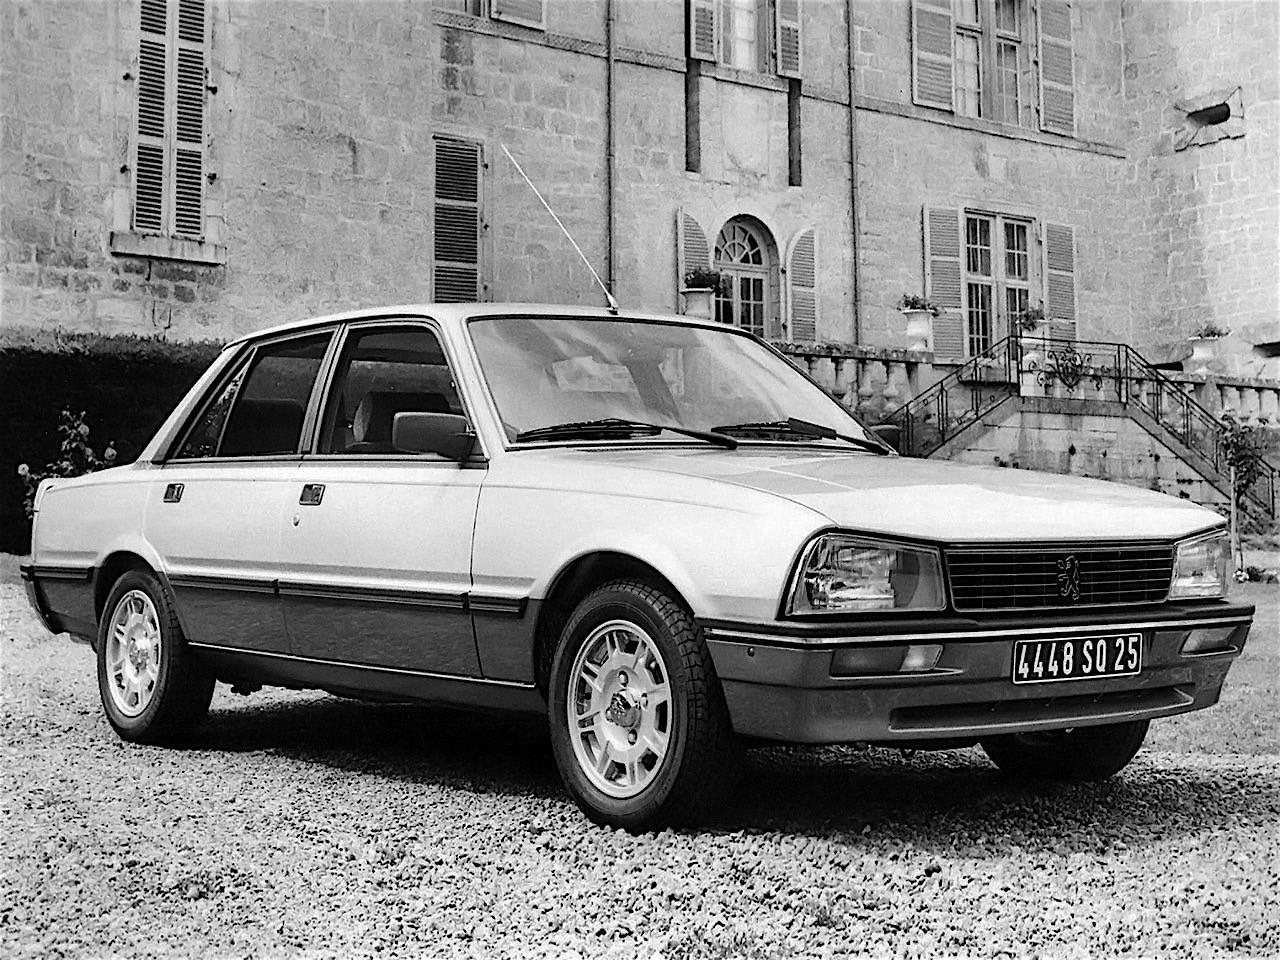 wrg 9165] peugeot 505 wiring diagram 1987-1992 Peugeot 505 Craigslist